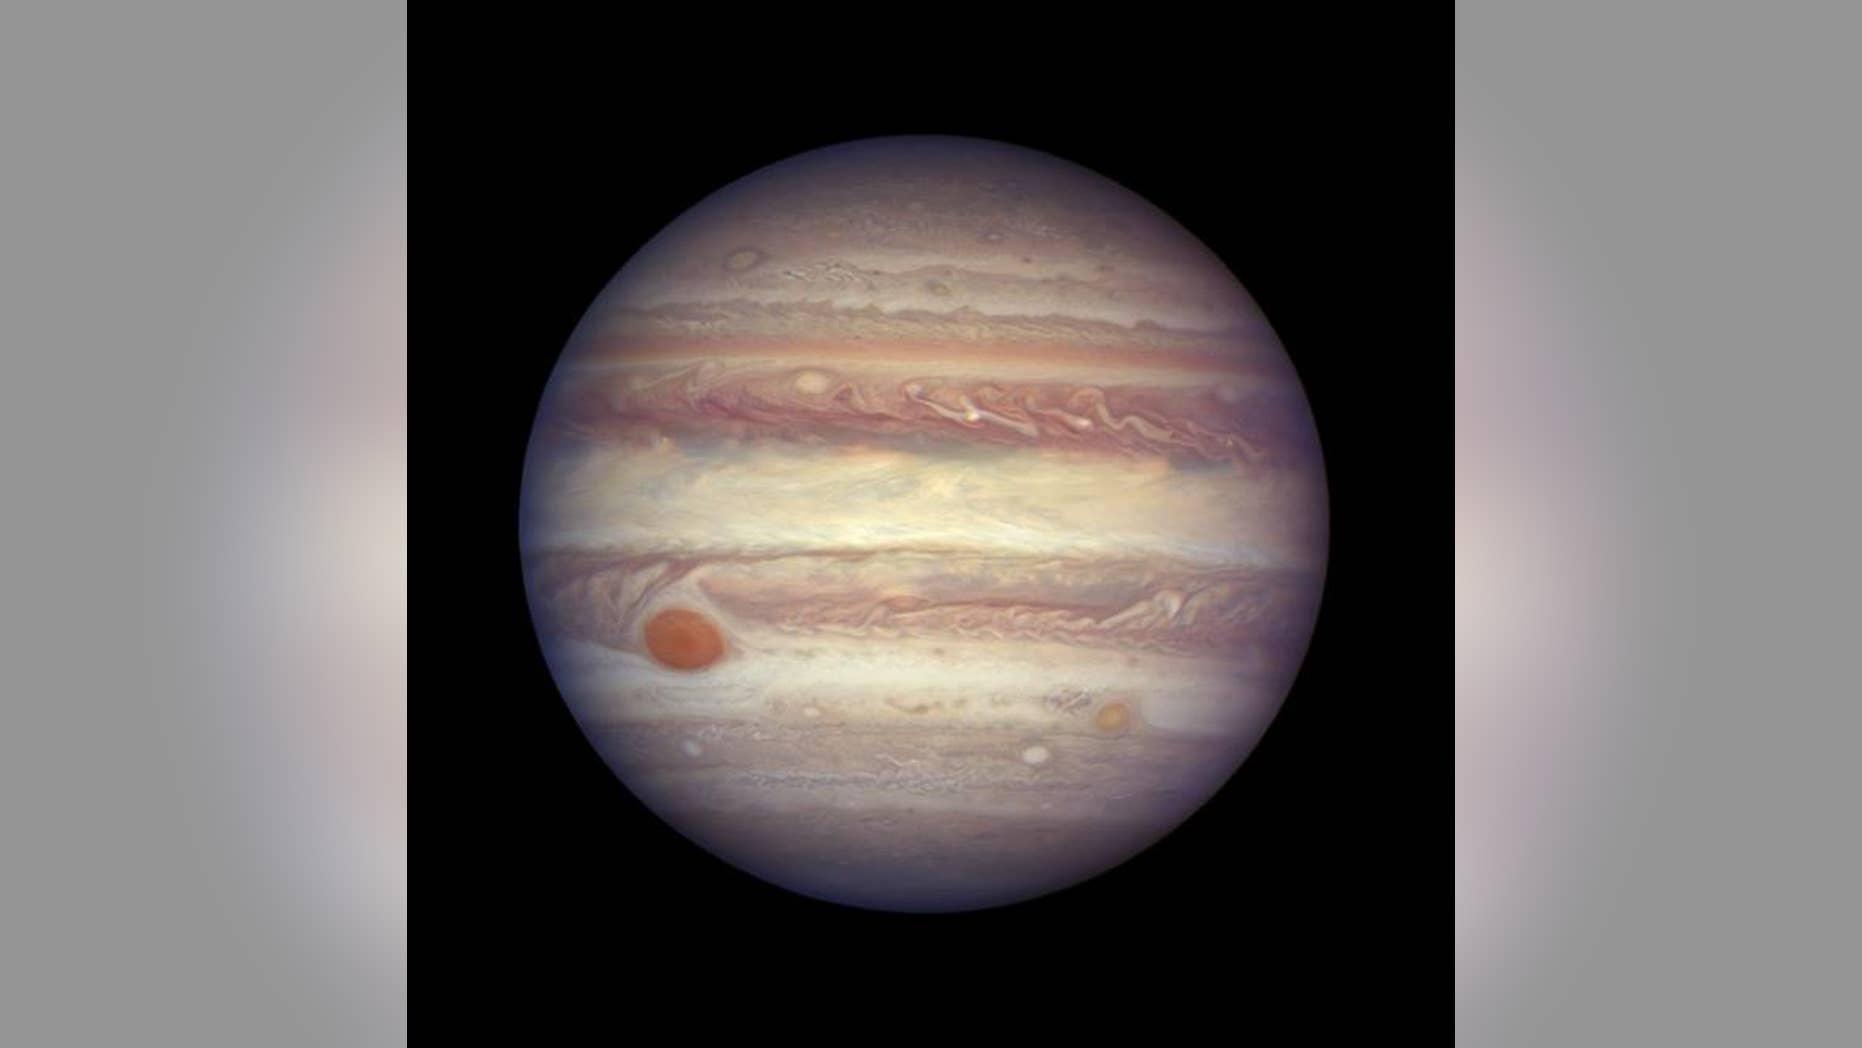 Byron's muse, Jupiter